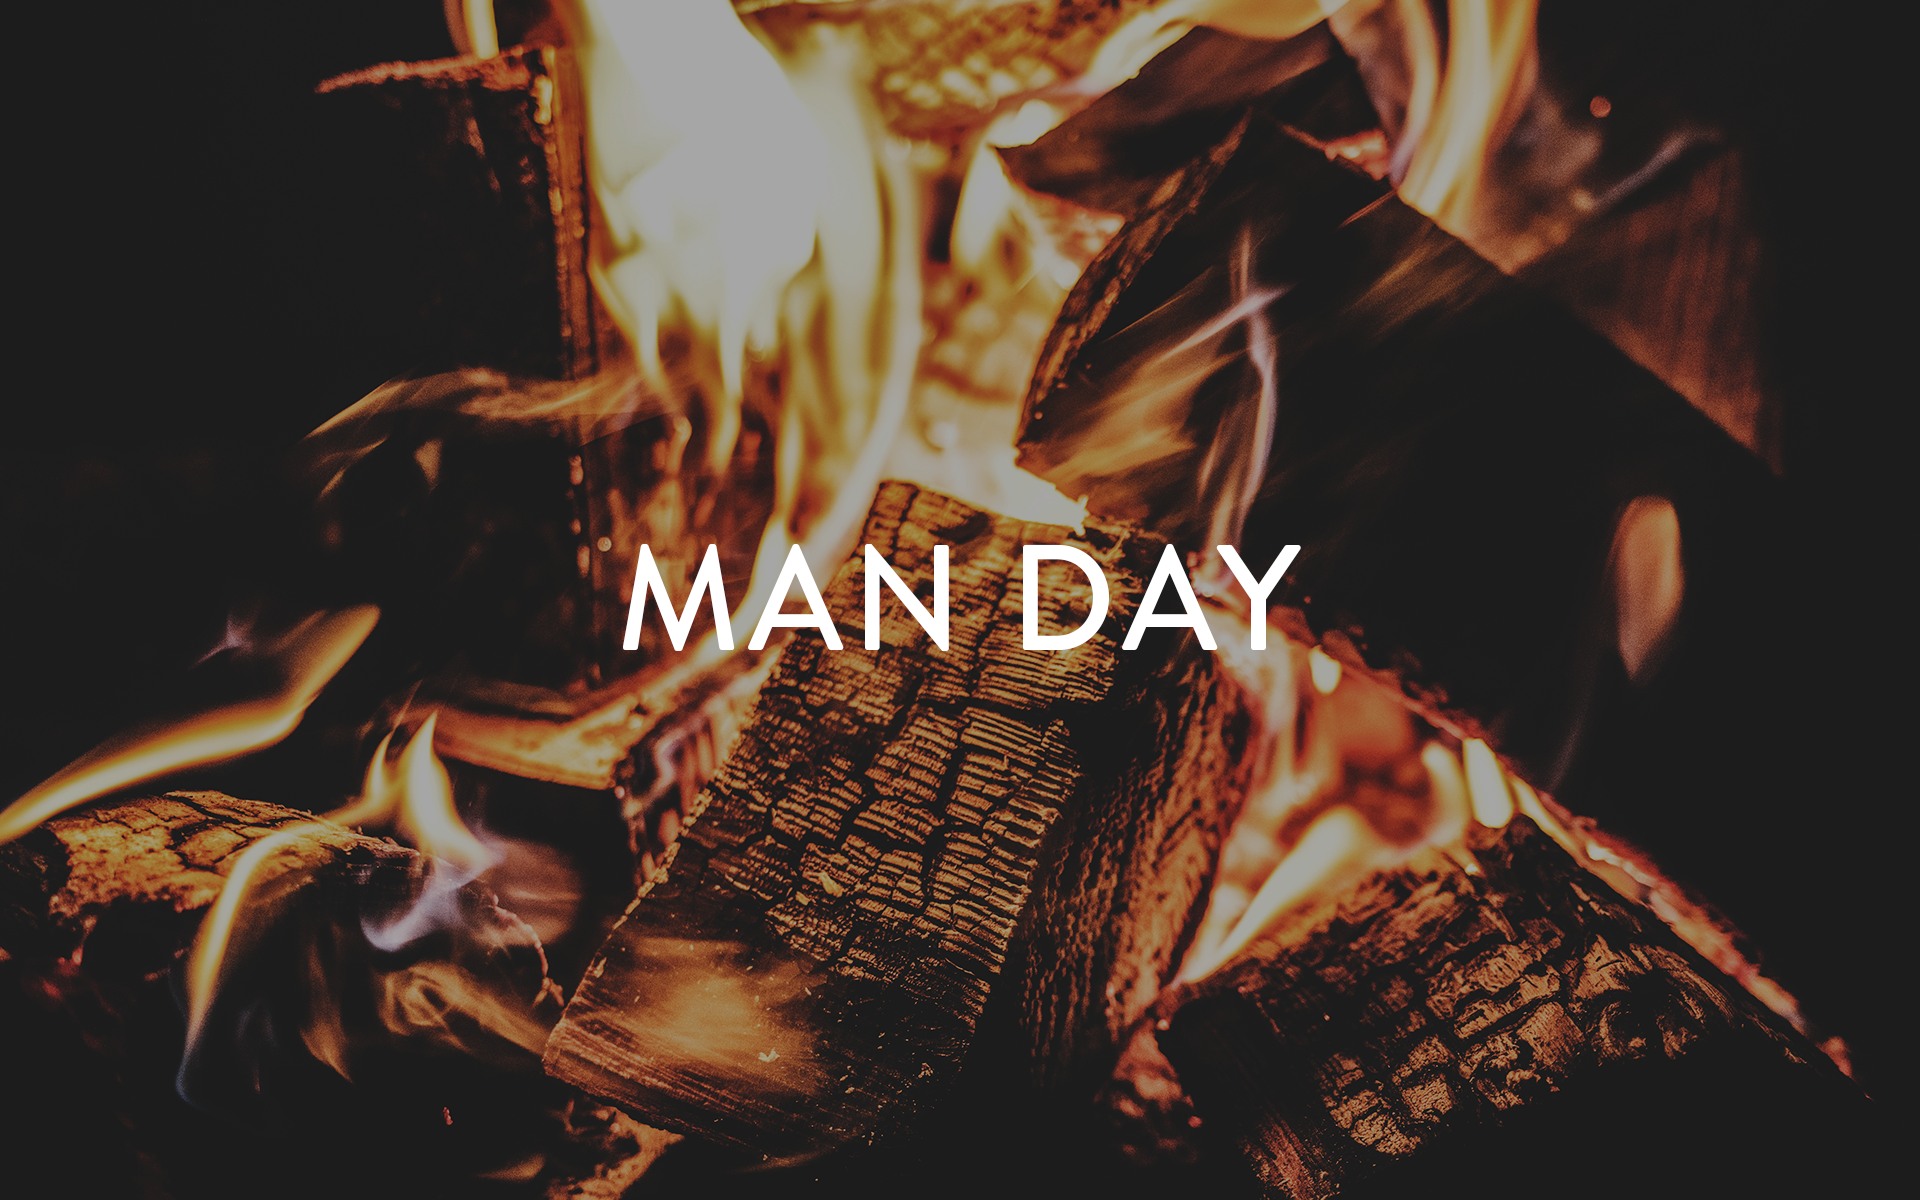 Man day